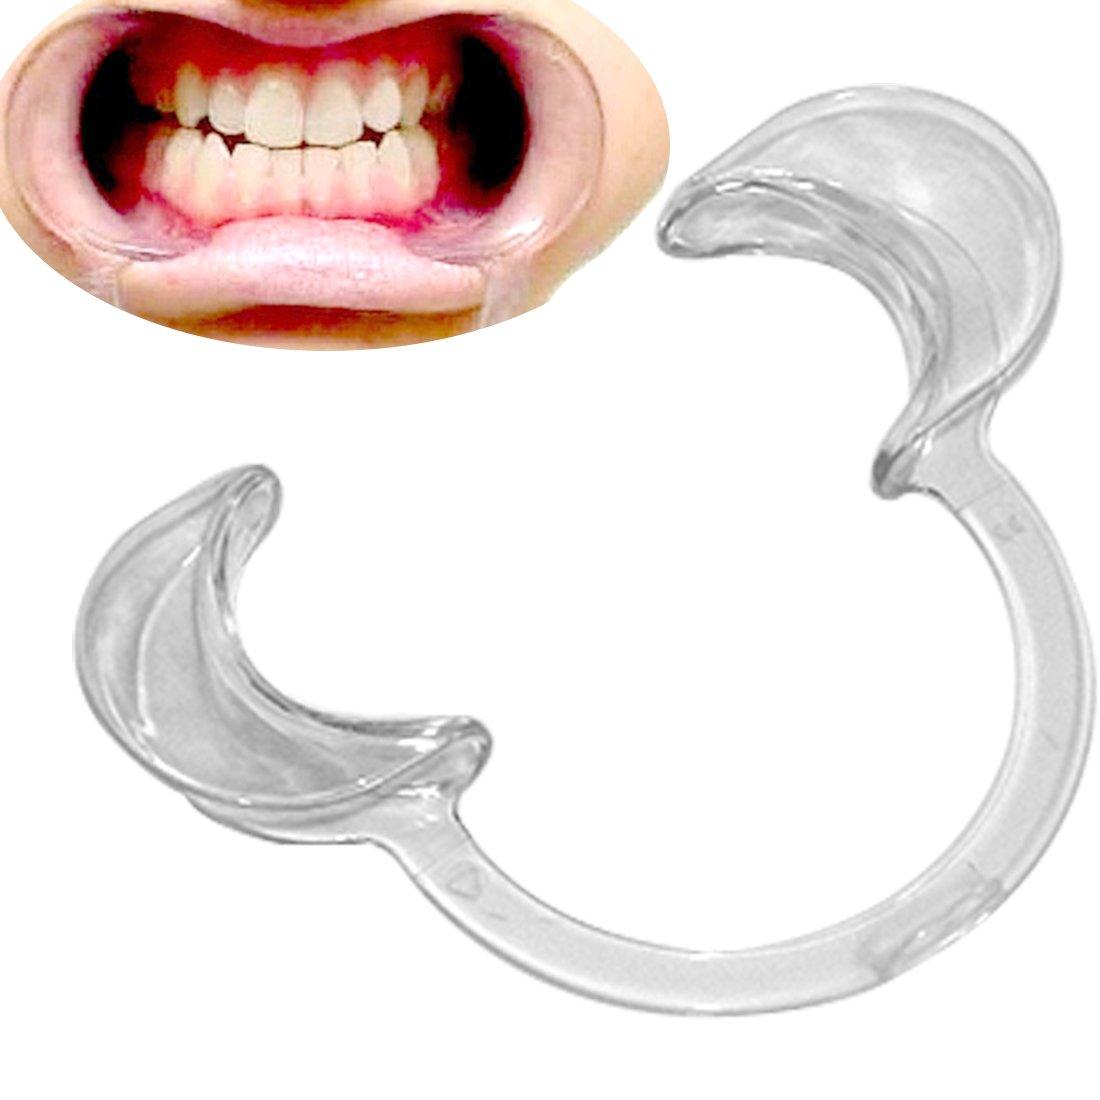 Dental mouth opener for sex